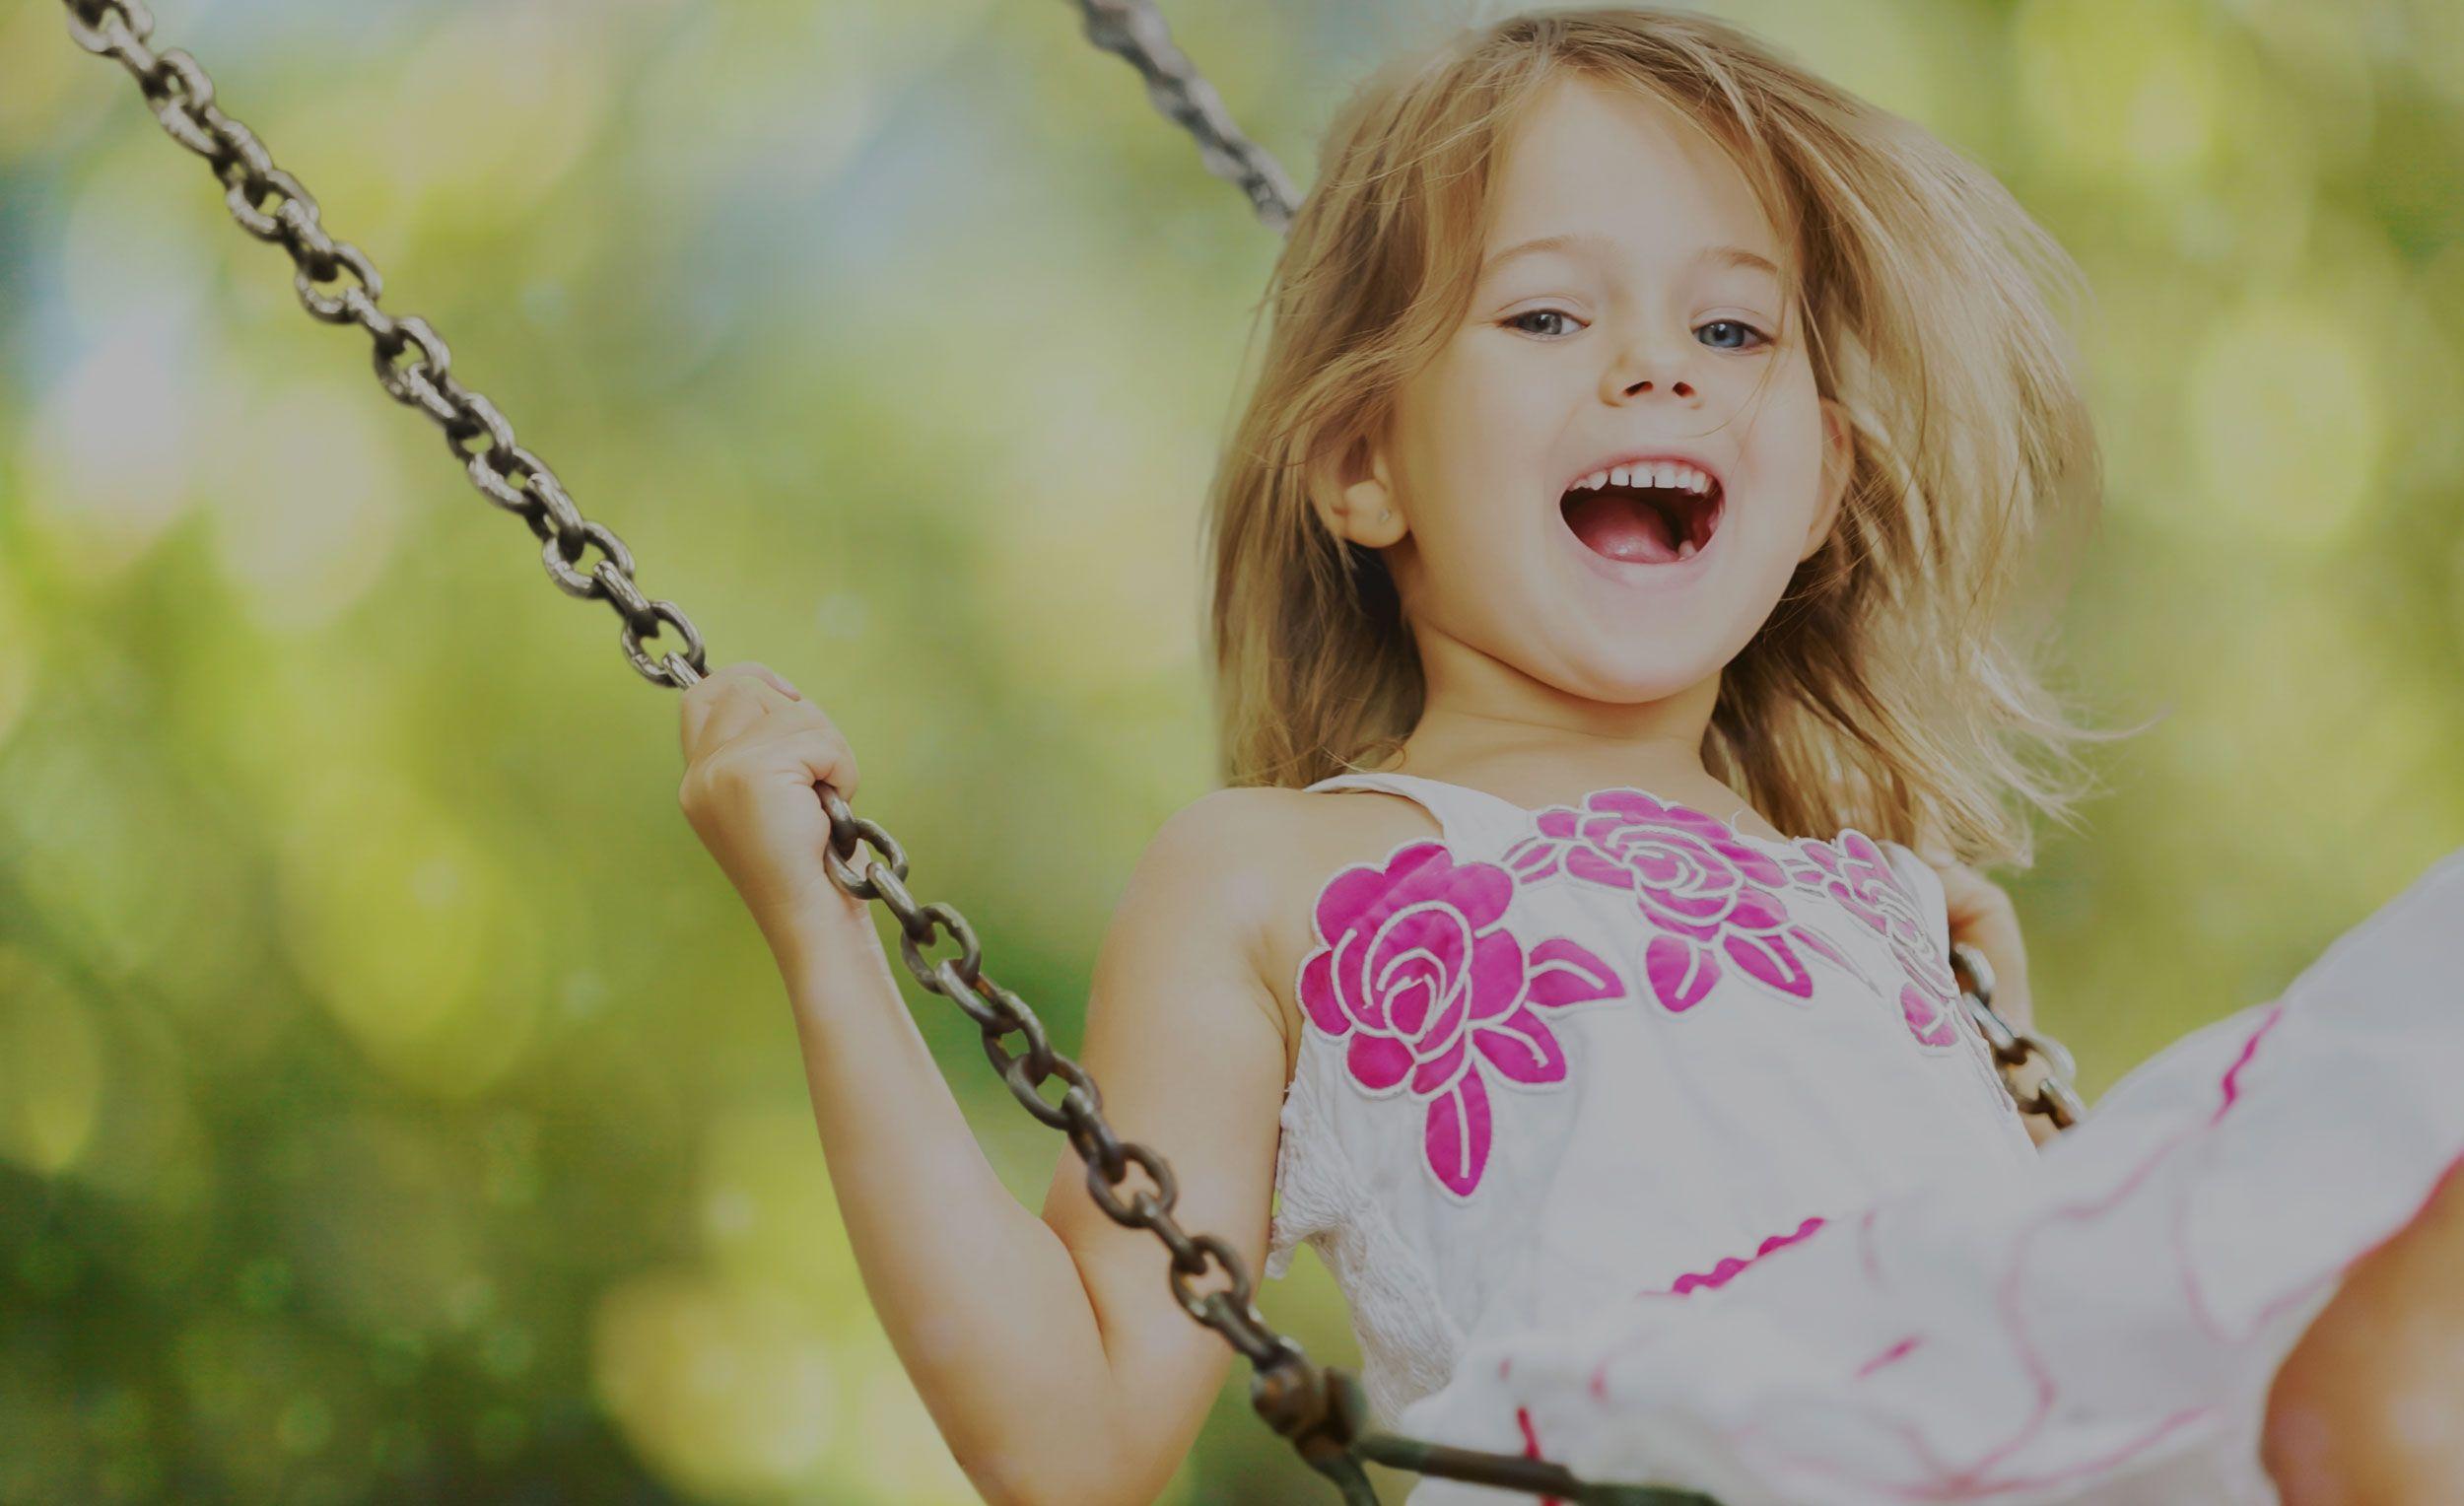 OurLittleHaven CedarRapids Iowa Daycare Preschool